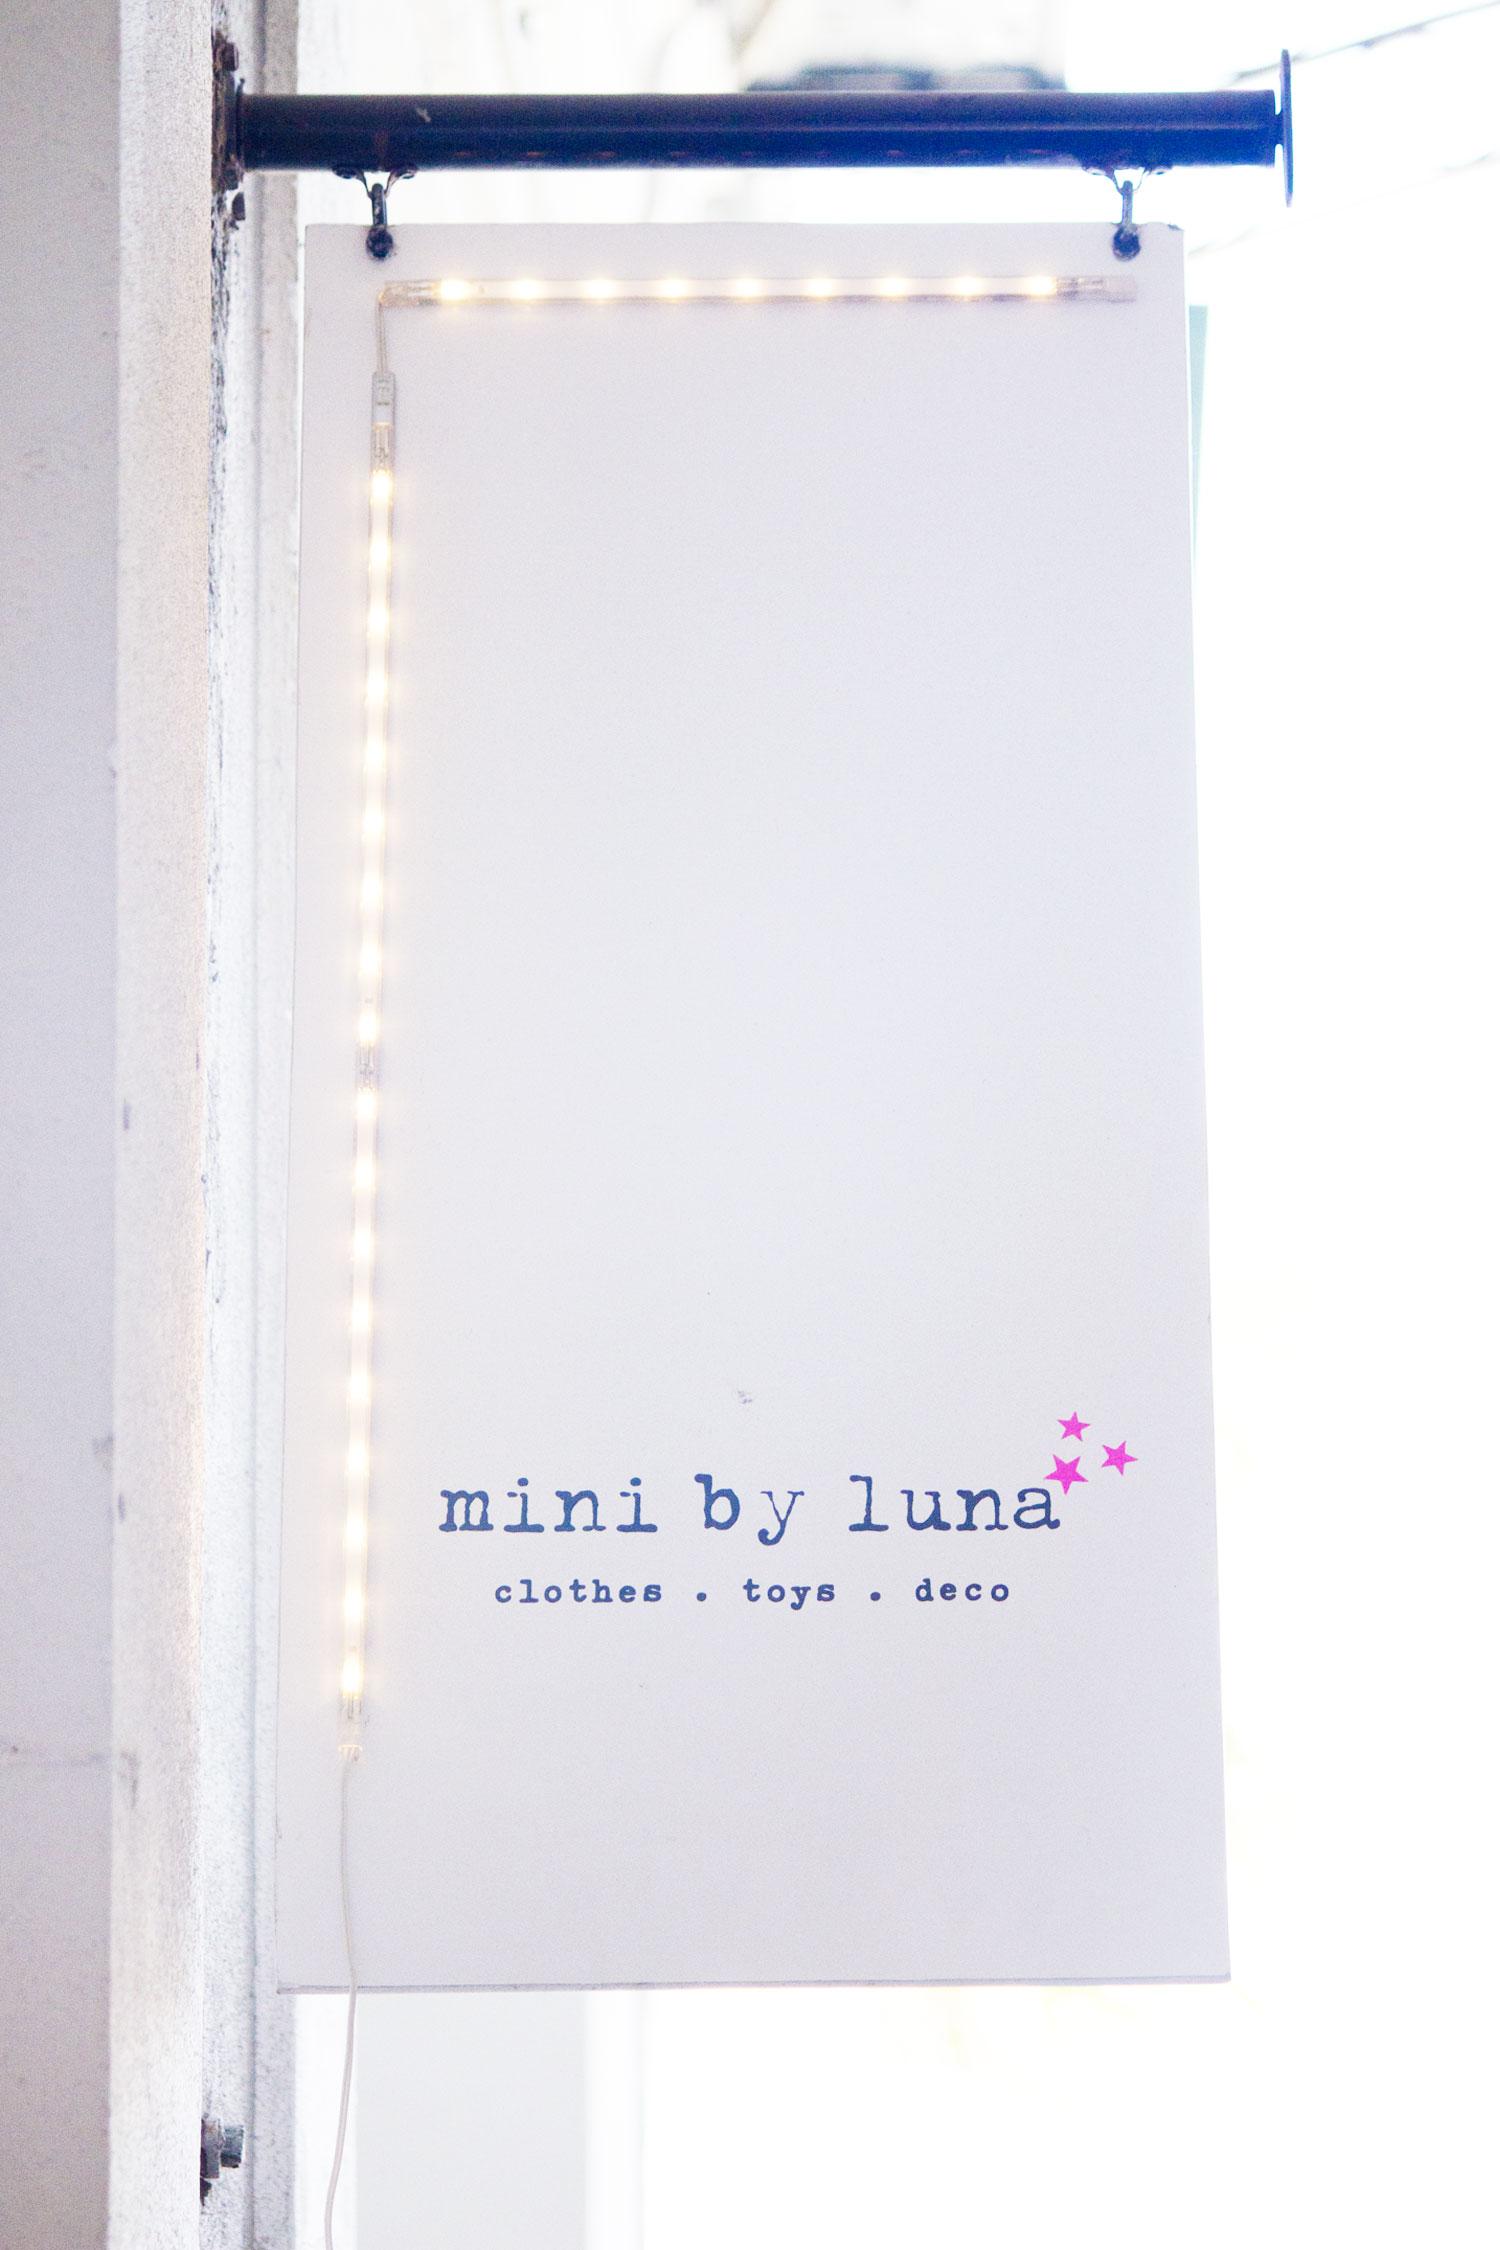 minibyluna43